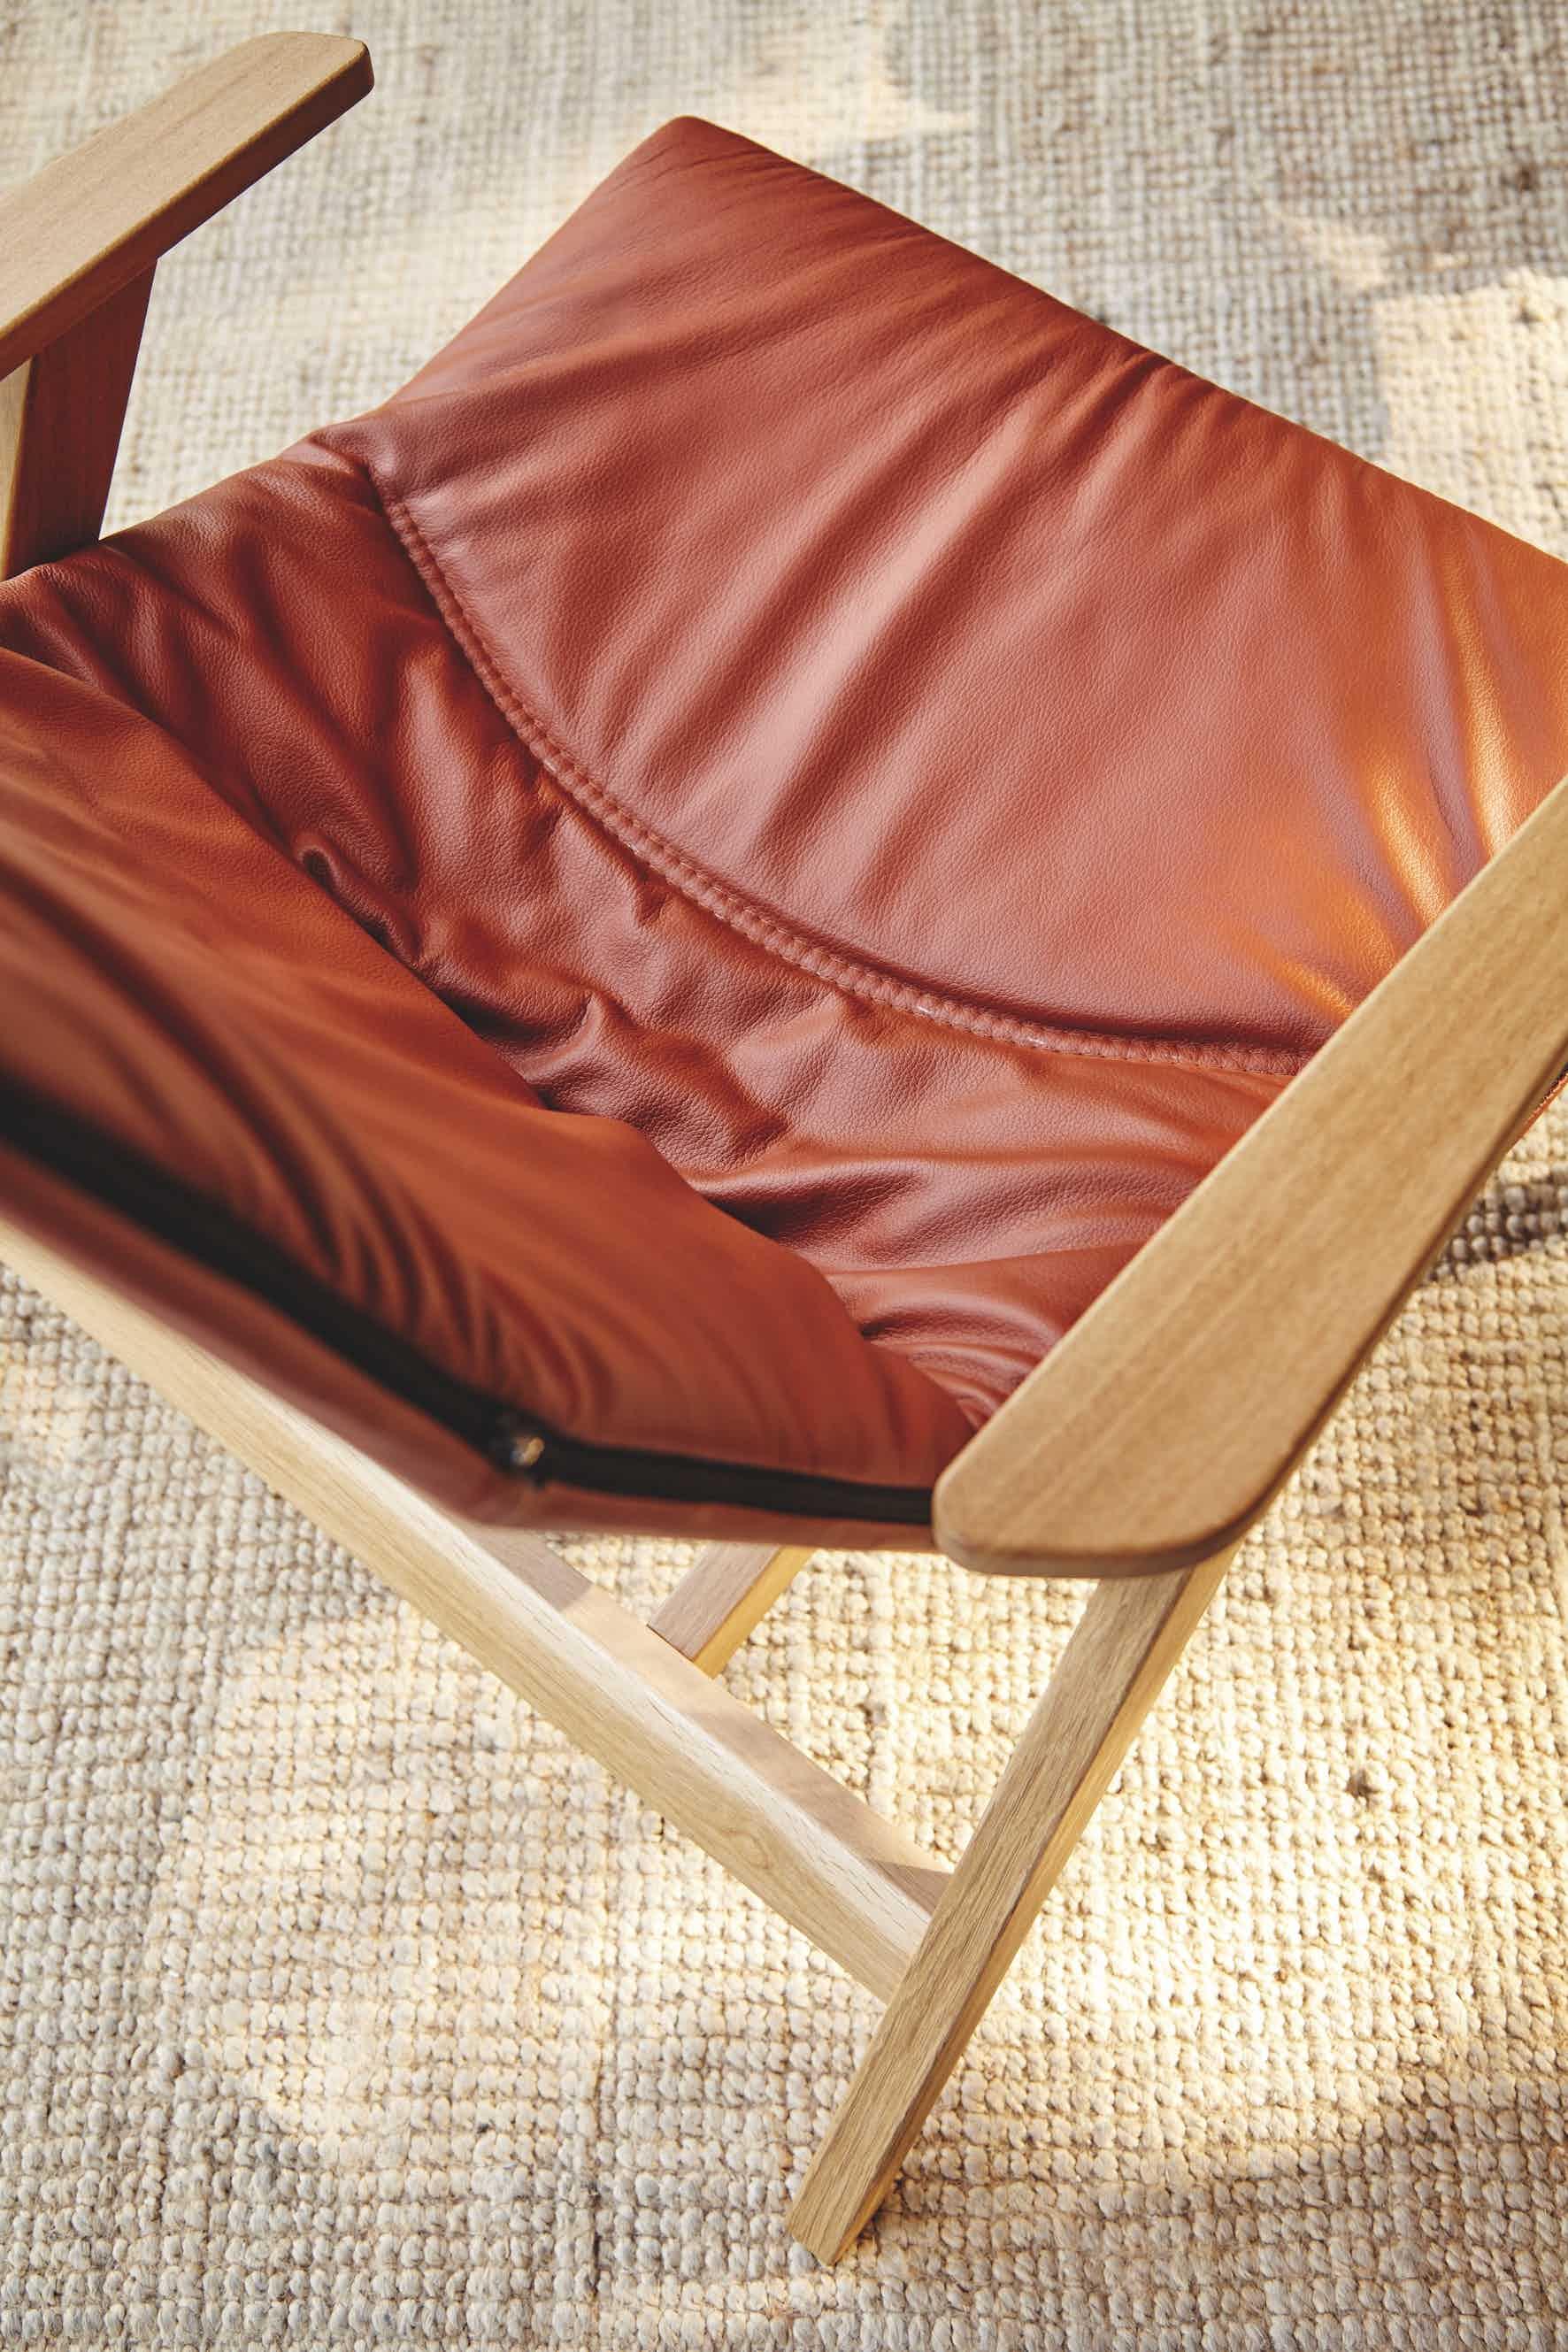 Viccarbe-top-detail-ace-armchair-institu-haute-living